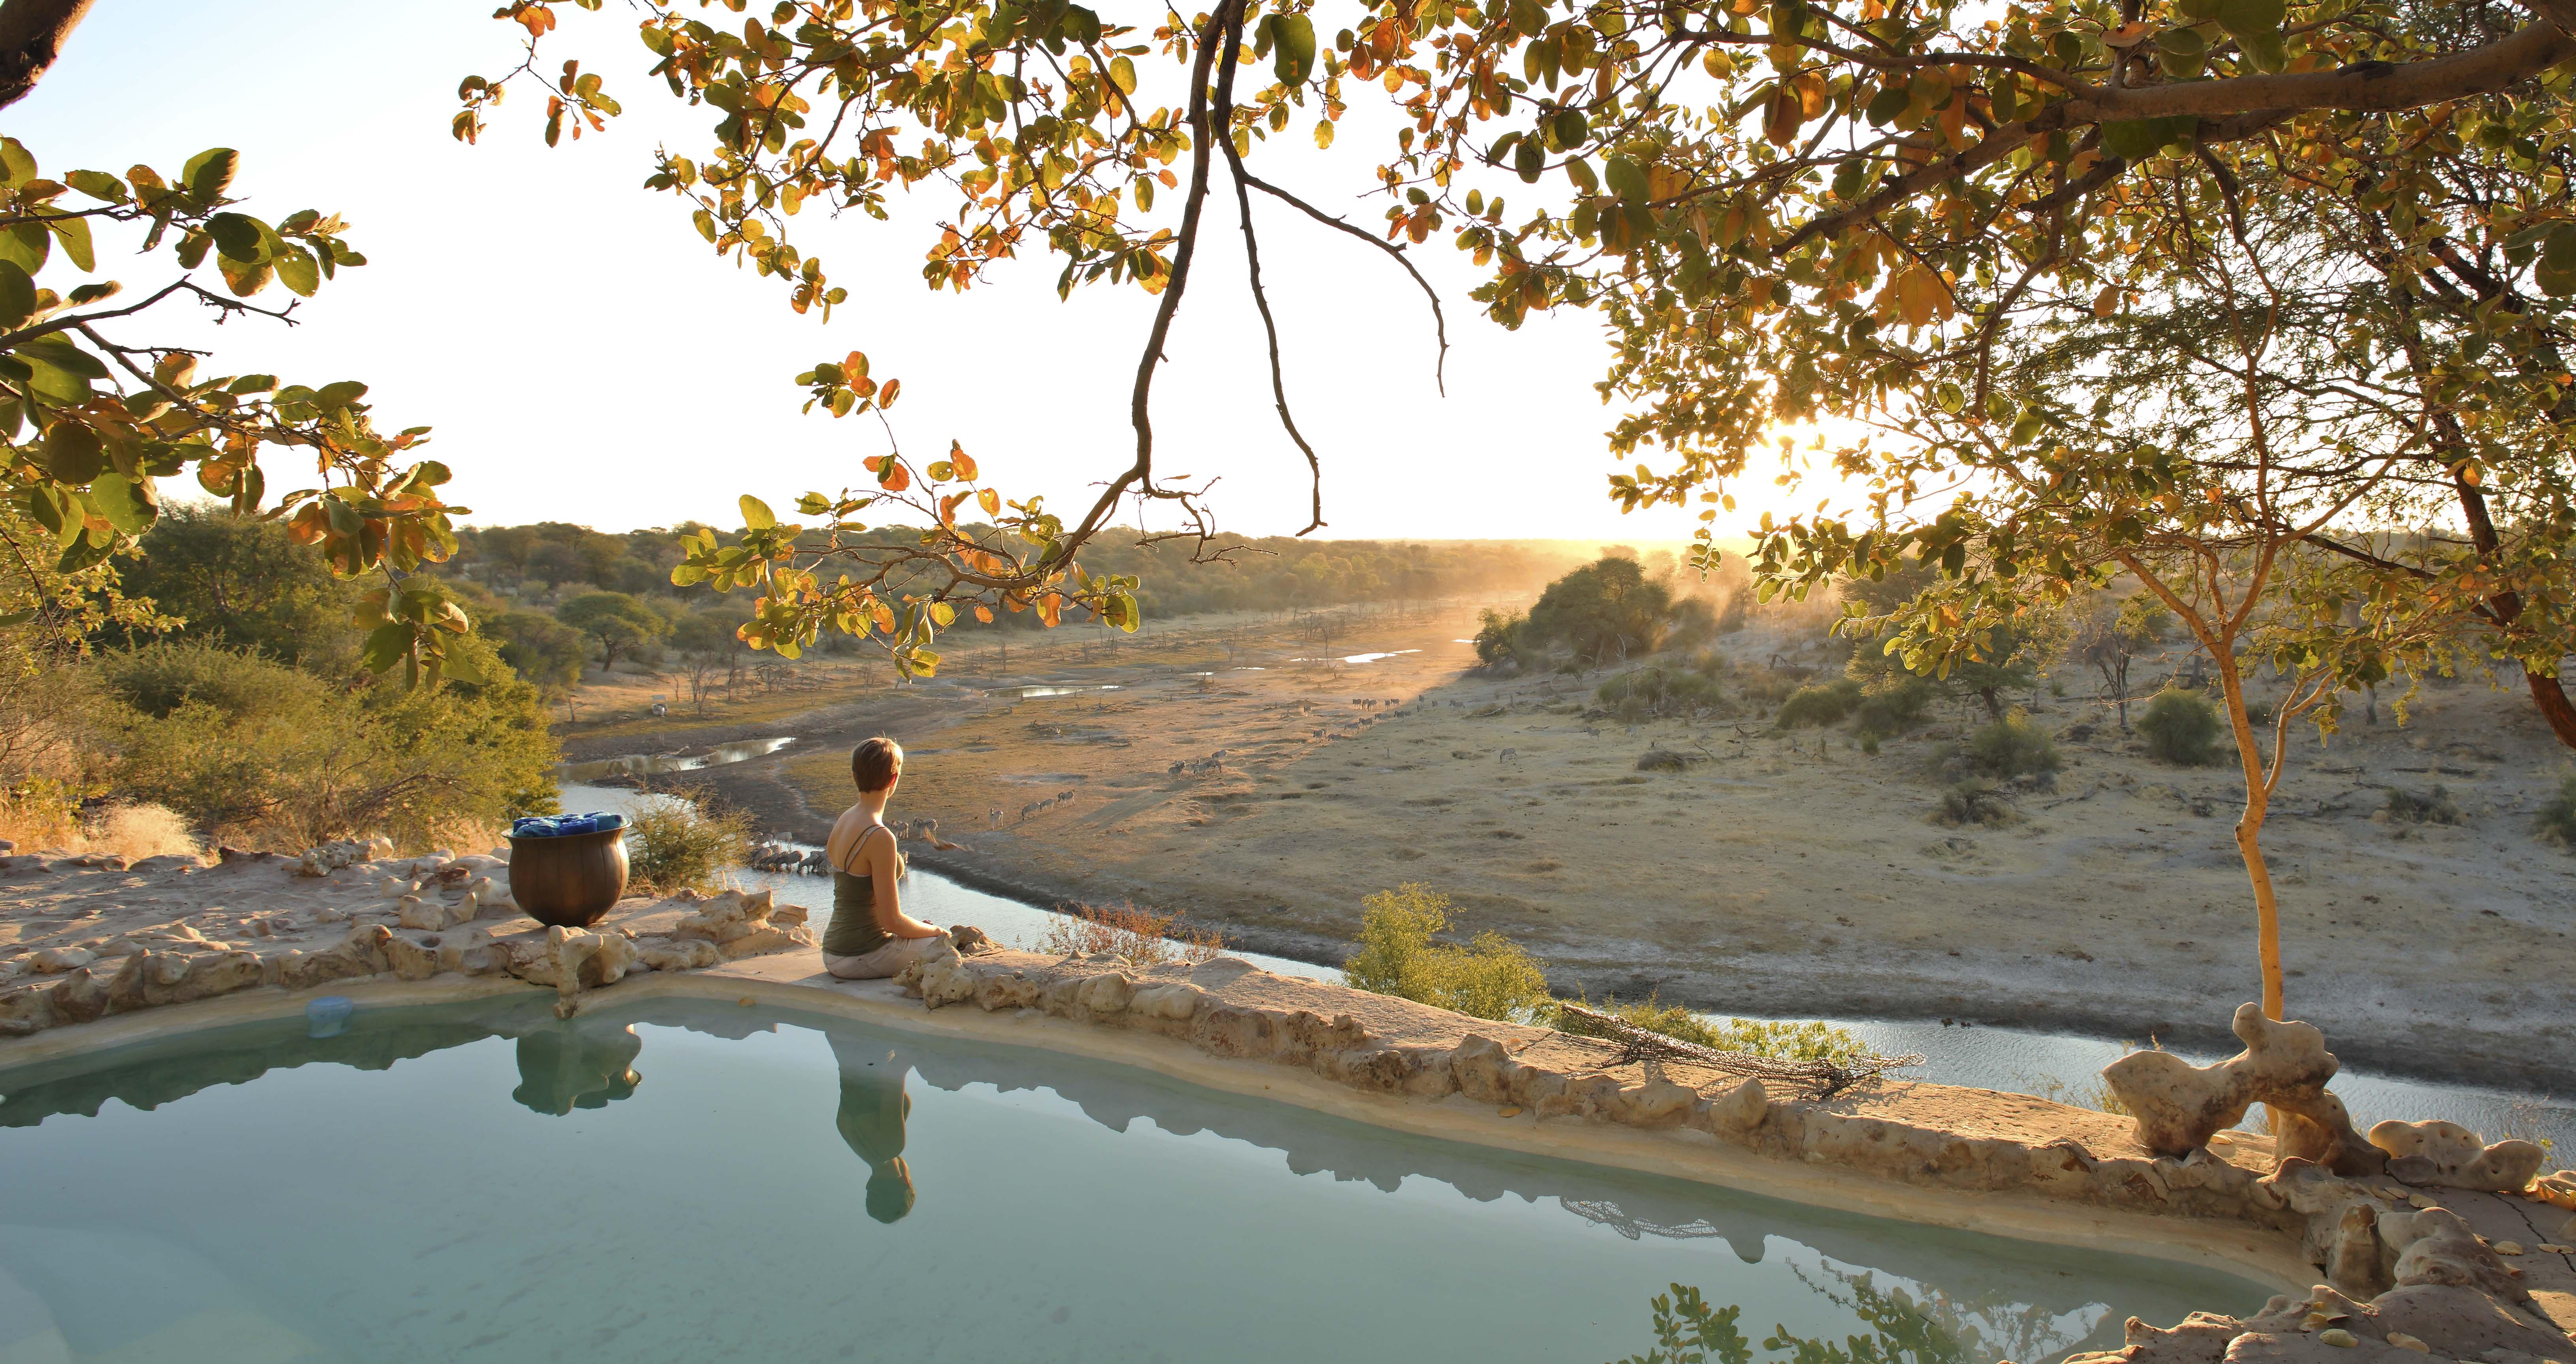 Meno a Kwena Pool View